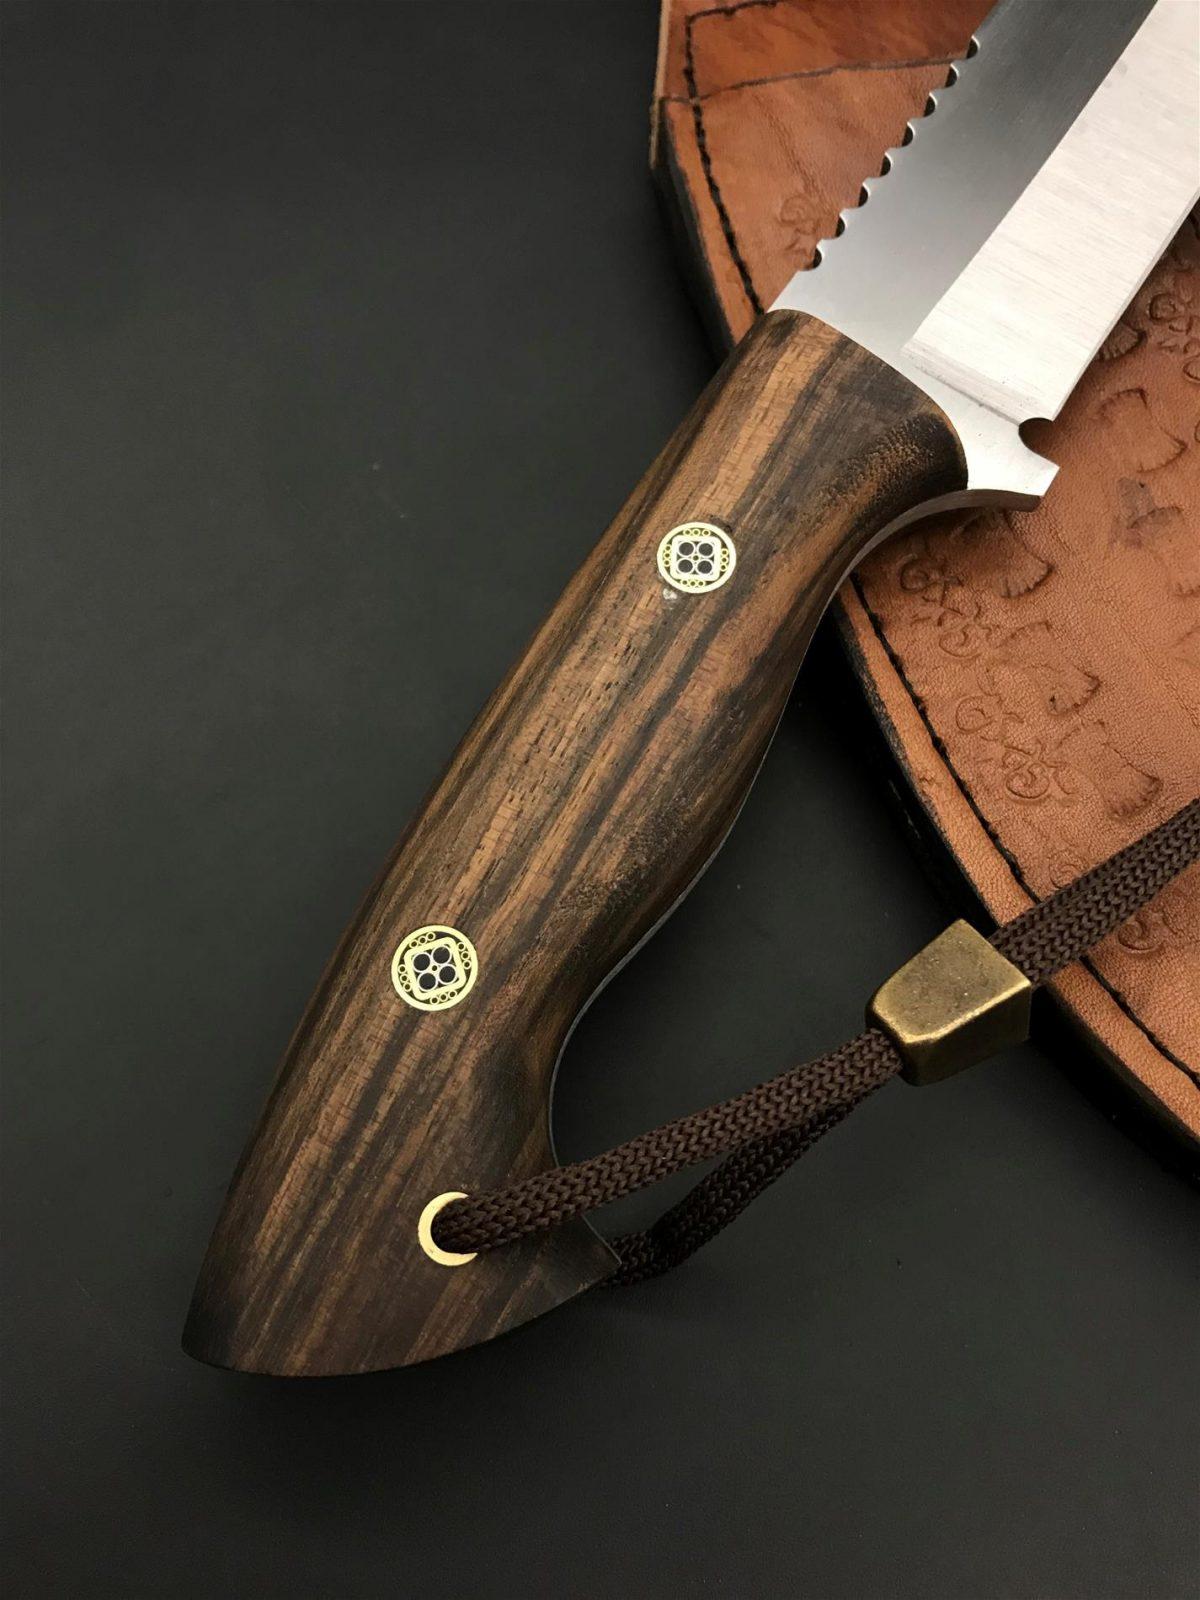 Handmade Camping Knife BB99 3 1 1200x1600 - Handmade Camping Knife BB99-3